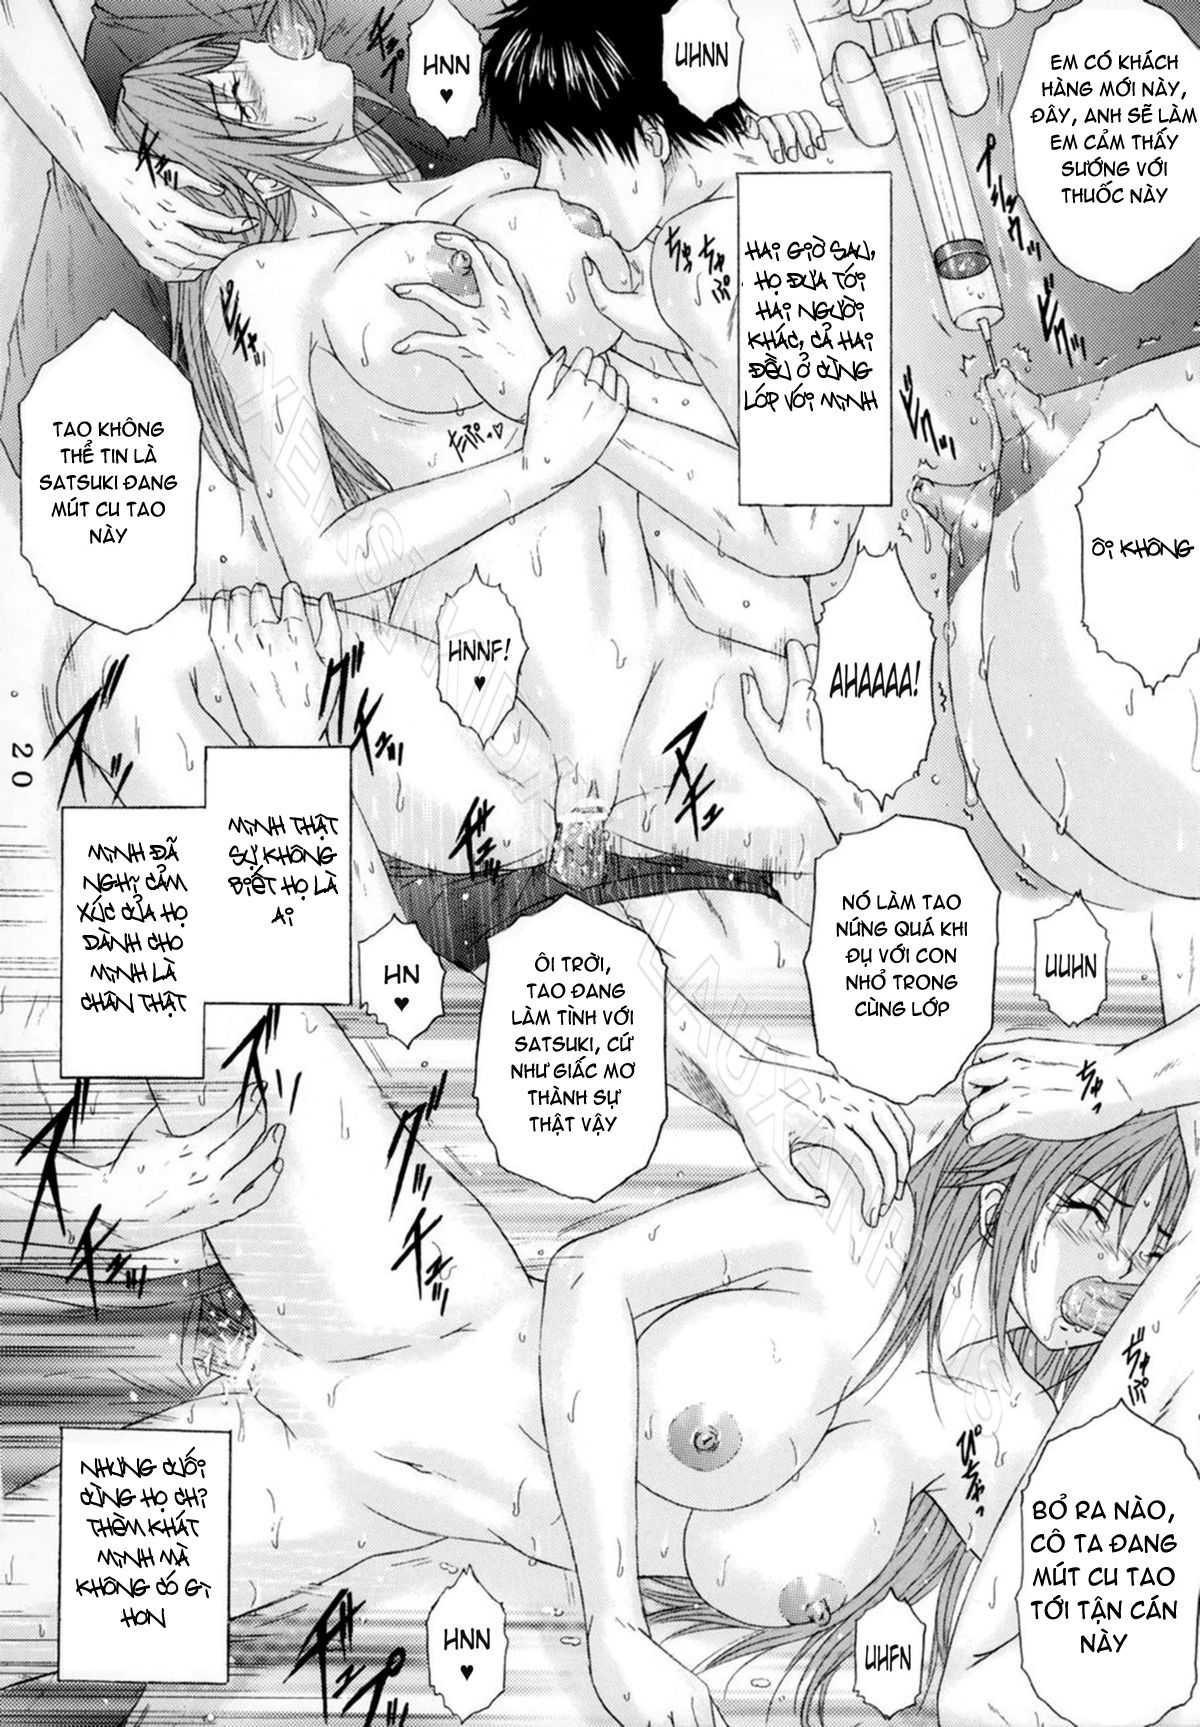 TruyenHay.Com - Ảnh 14 - Ryoujoku Rensa Chapter 7